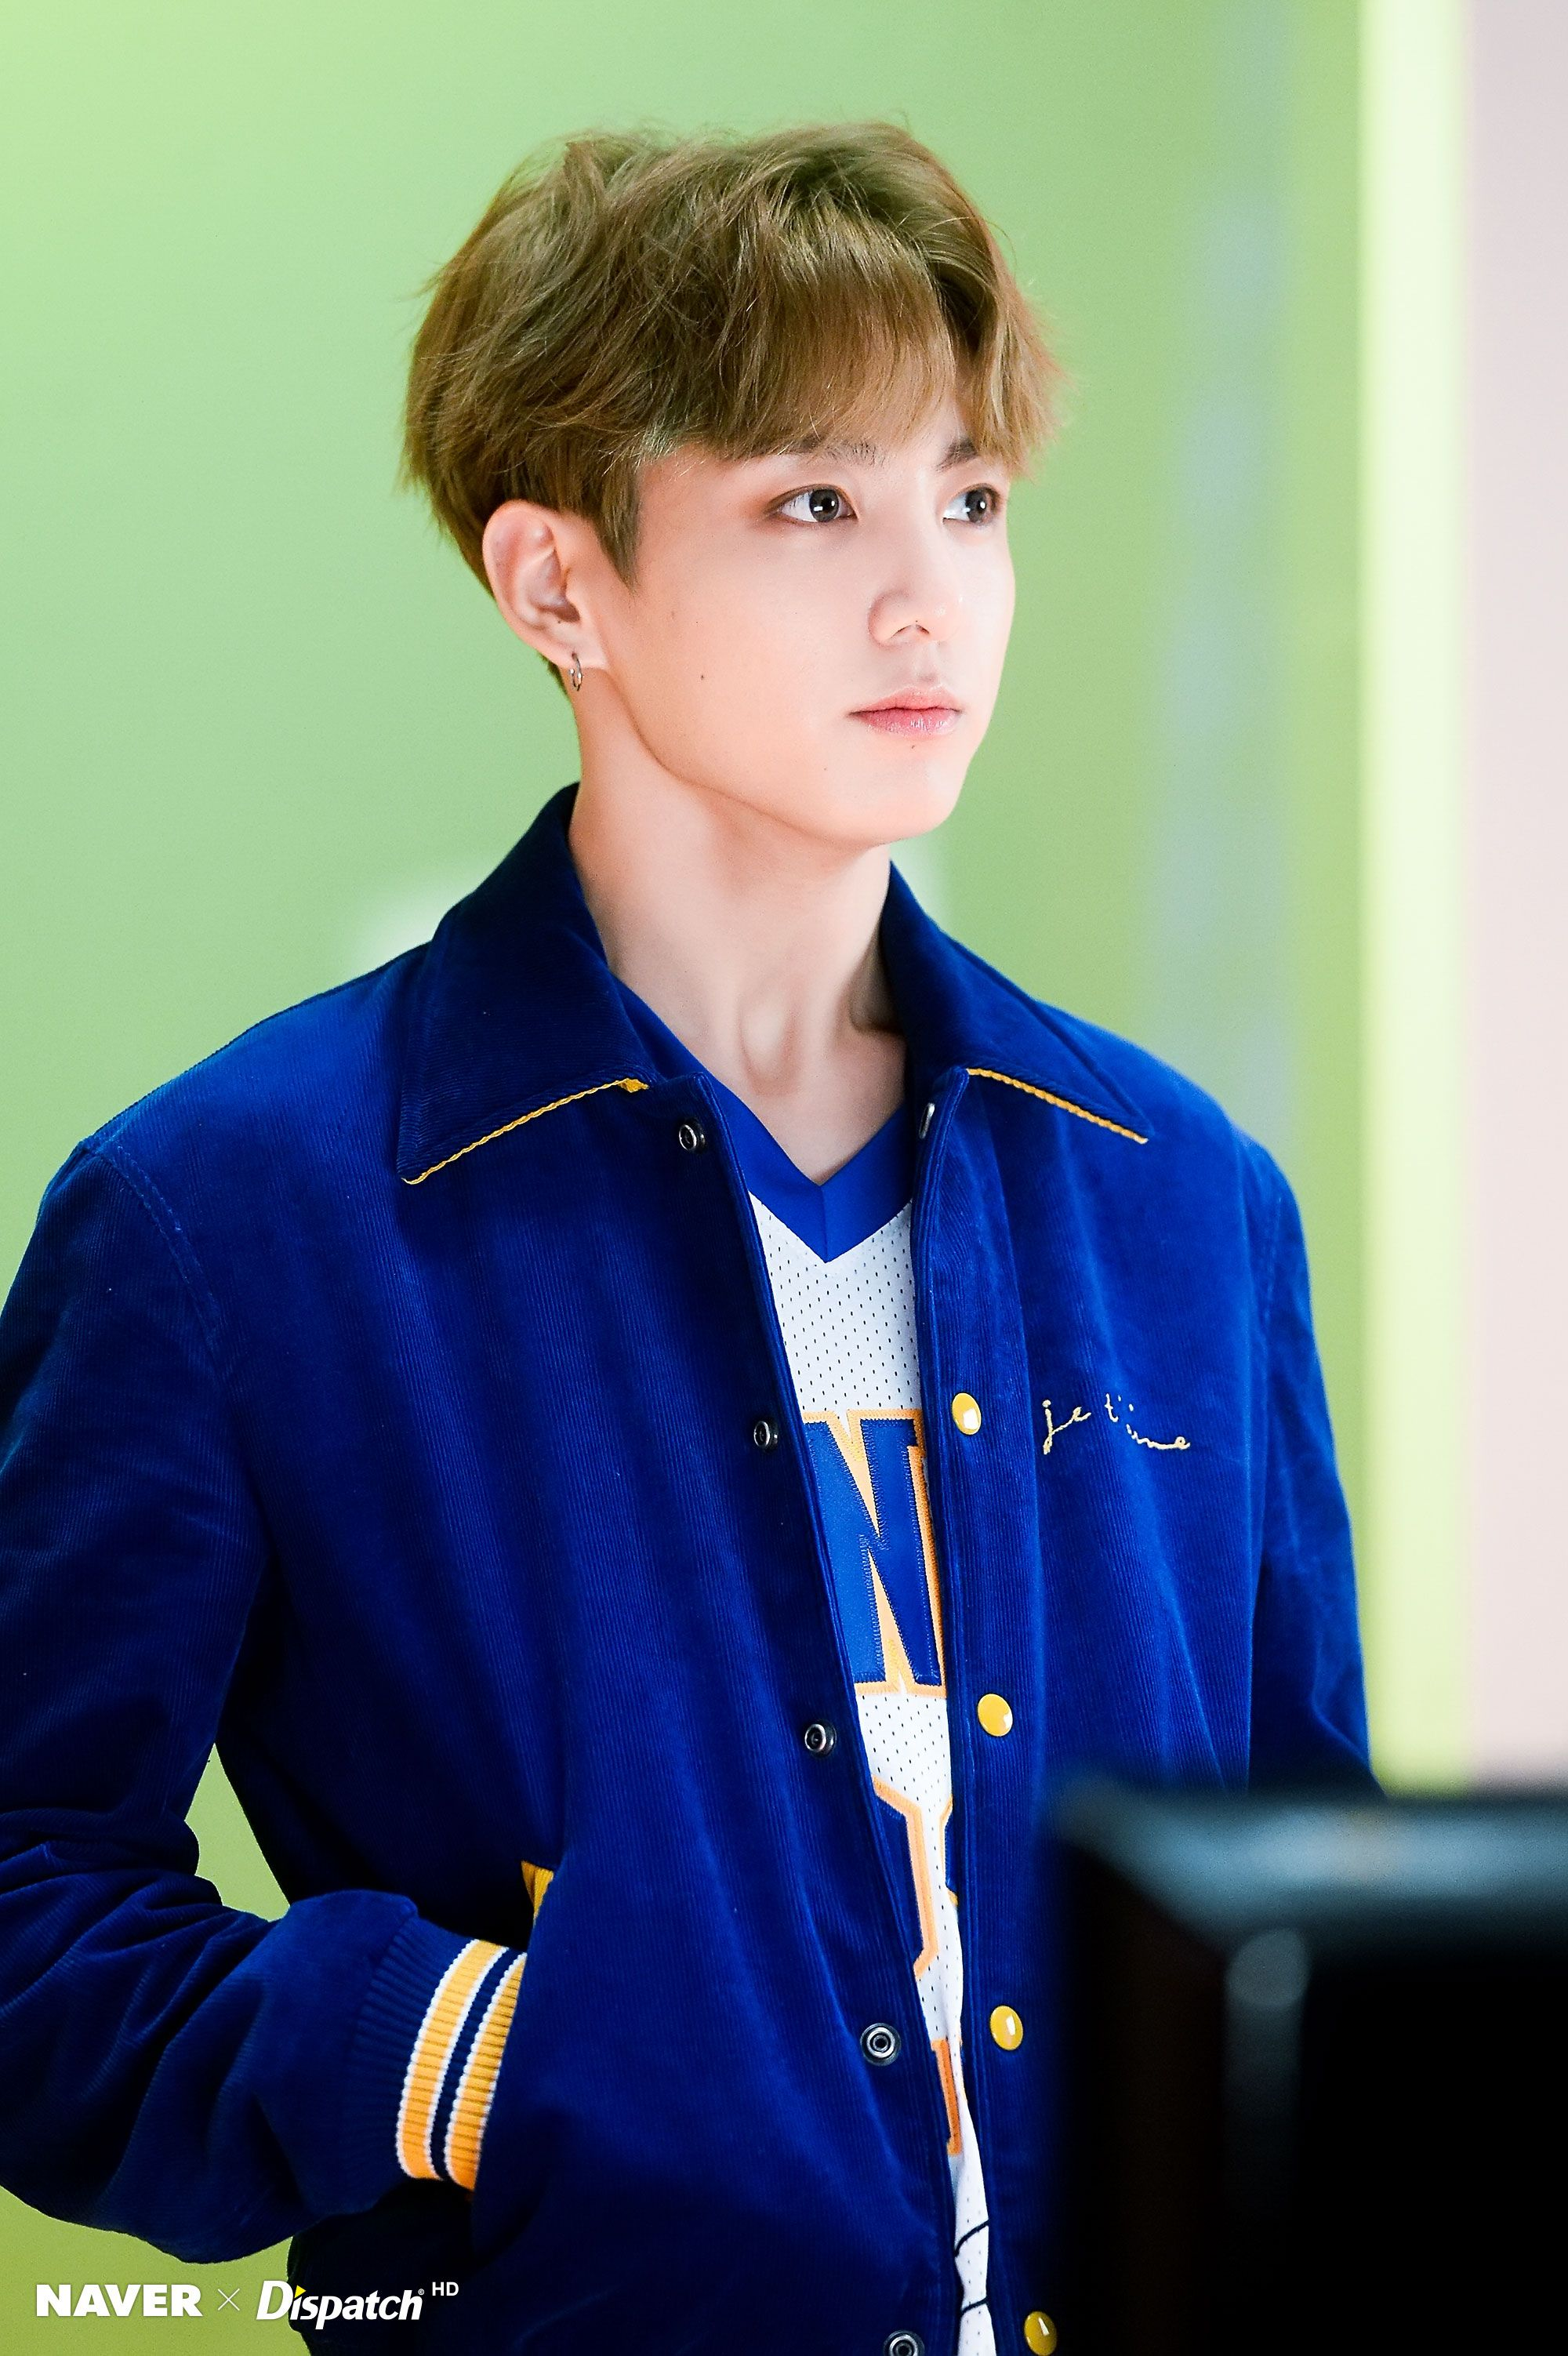 1 said hairstyle boy dispatch bts udnau mv set photos bts 방탄소년단  life